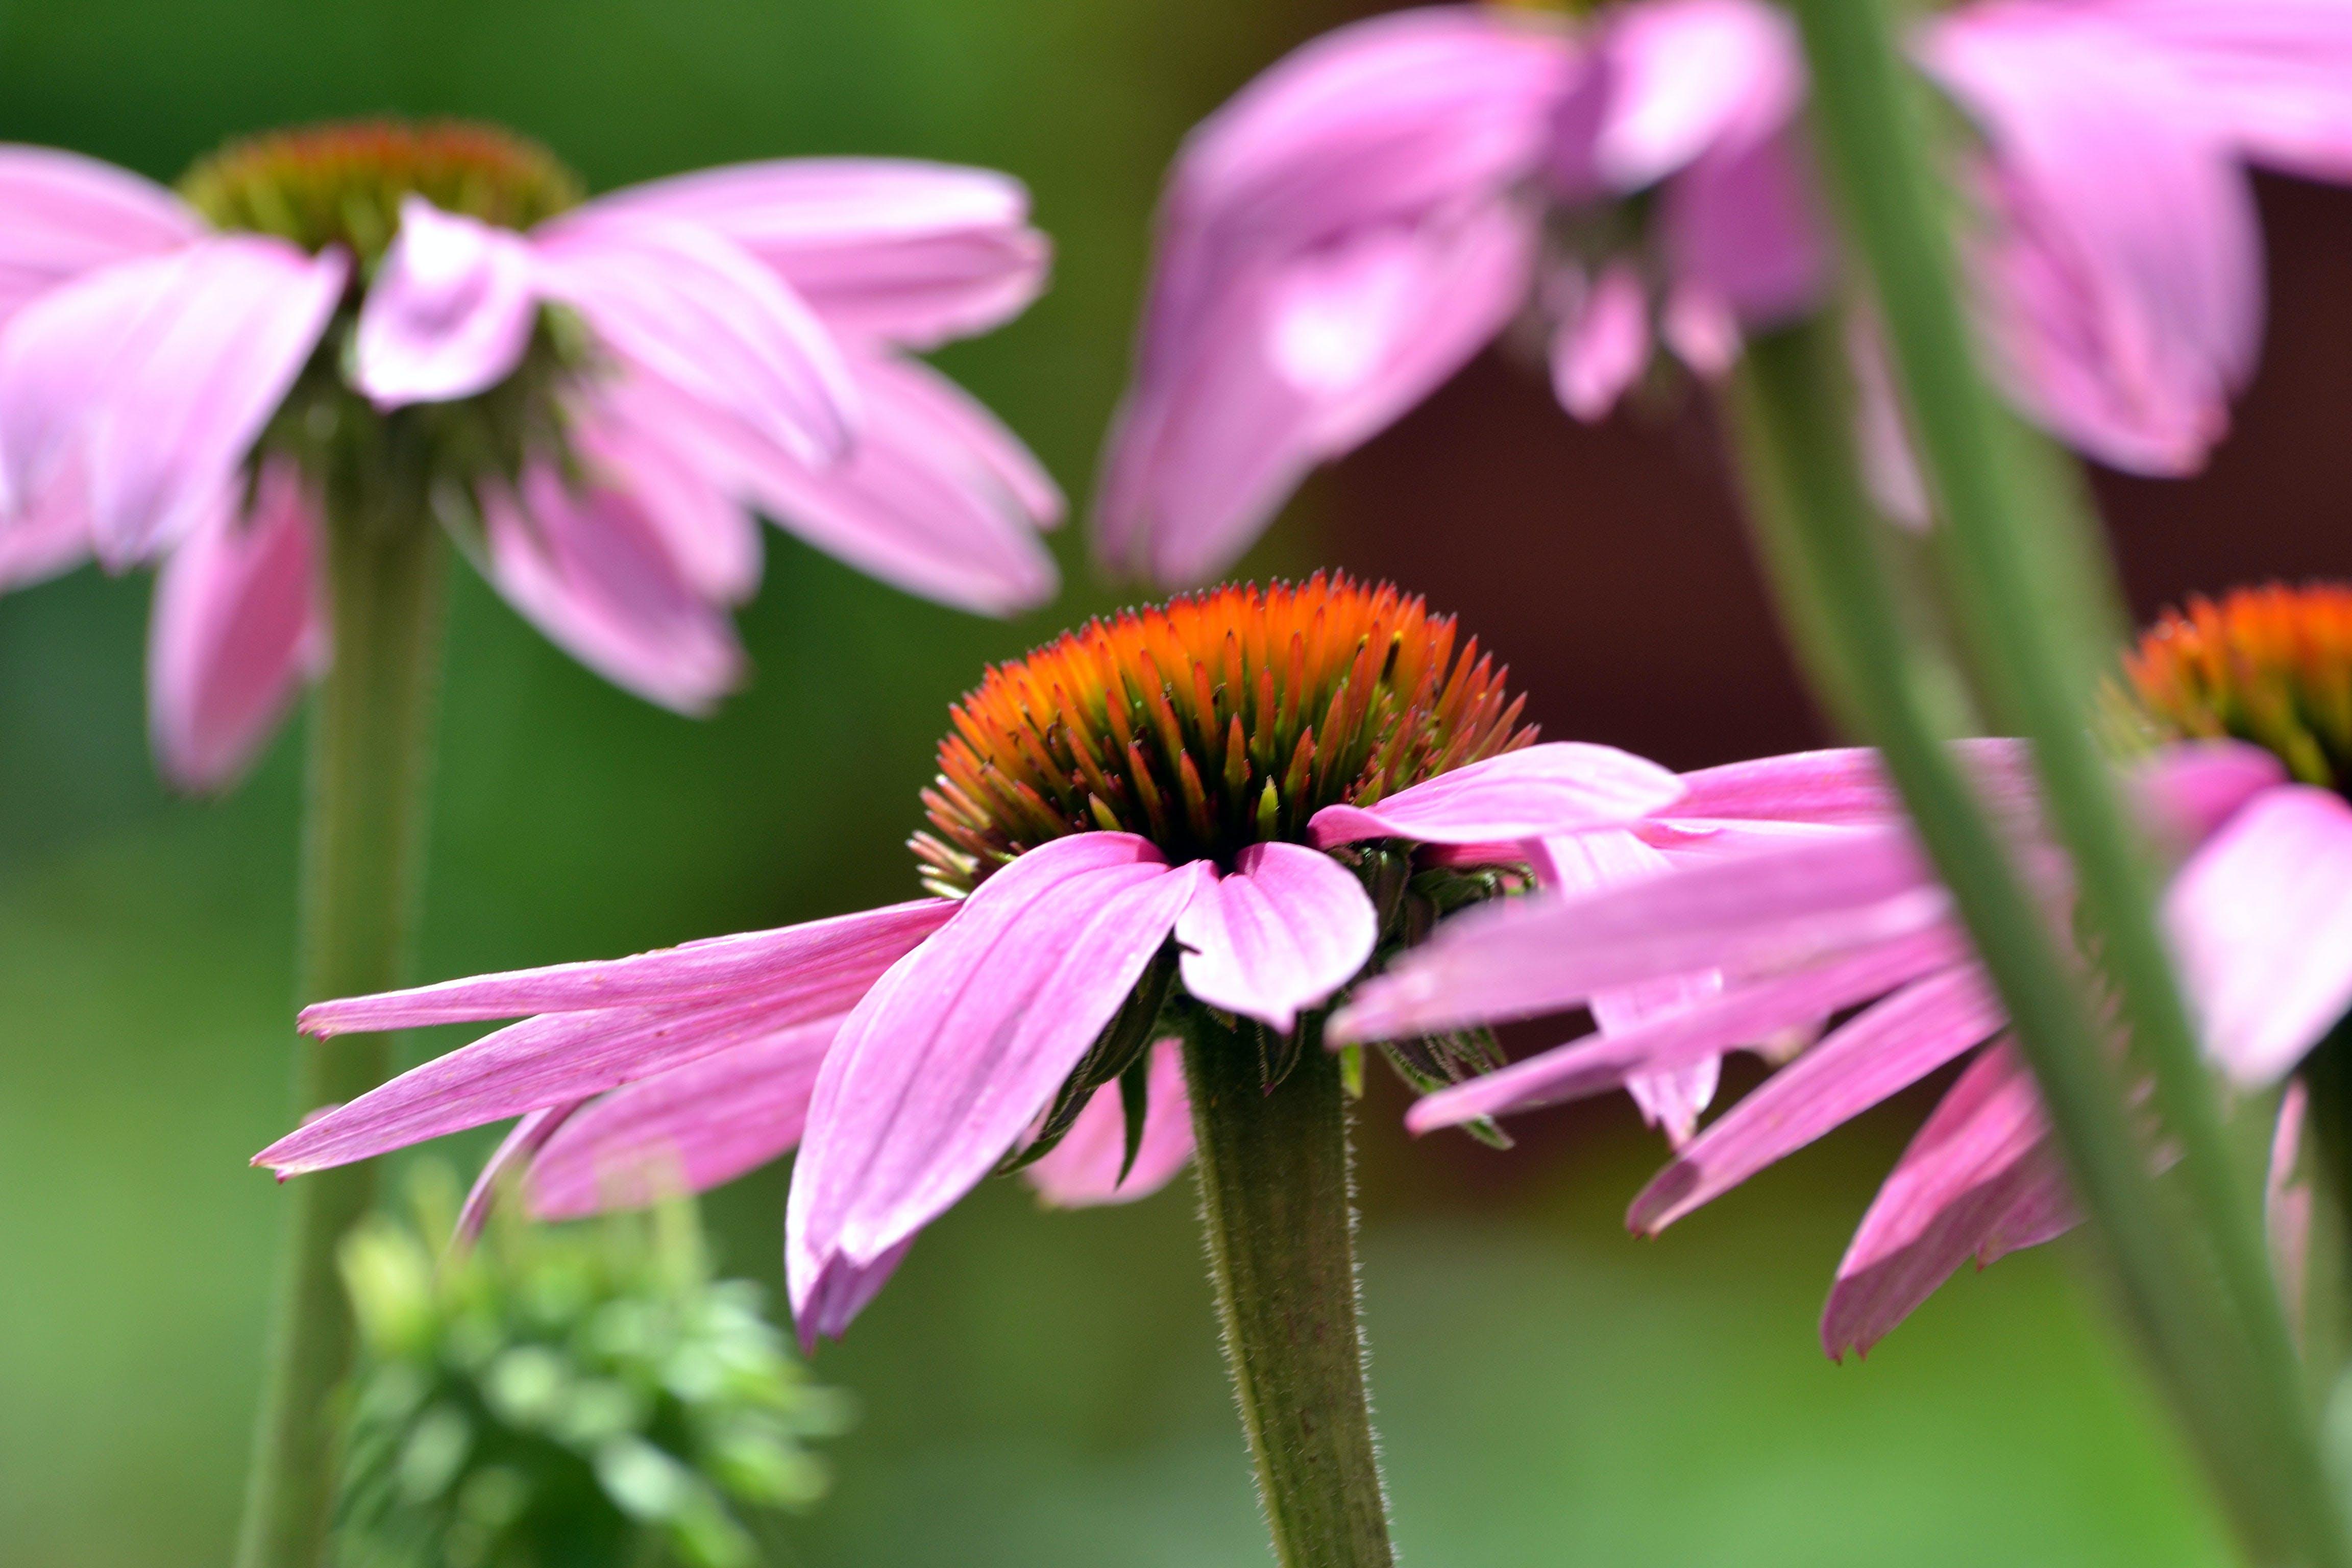 Free stock photo of beautiful flowers, mother nature, seasonal